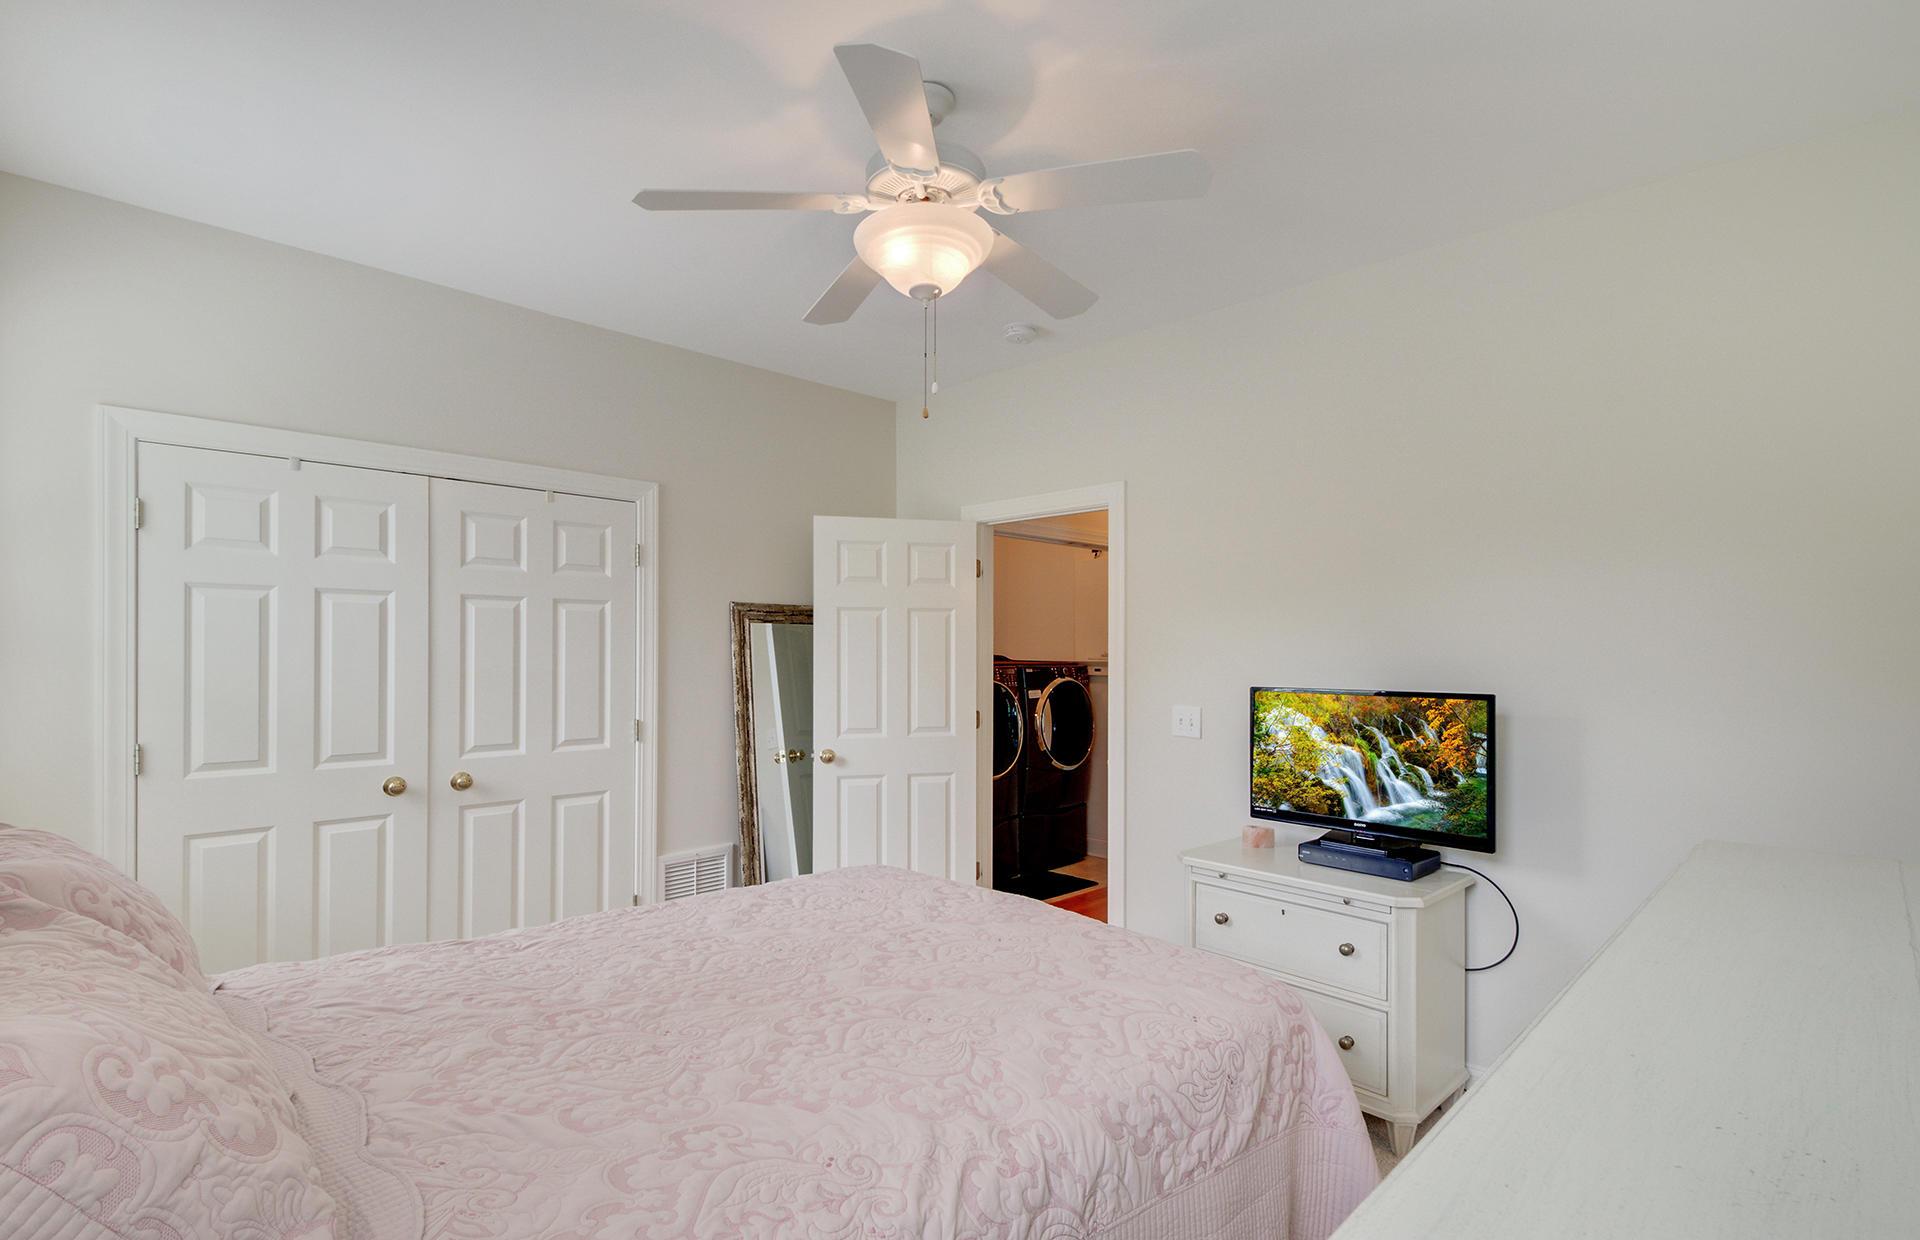 Dunes West Homes For Sale - 2453 Darts Cove, Mount Pleasant, SC - 1